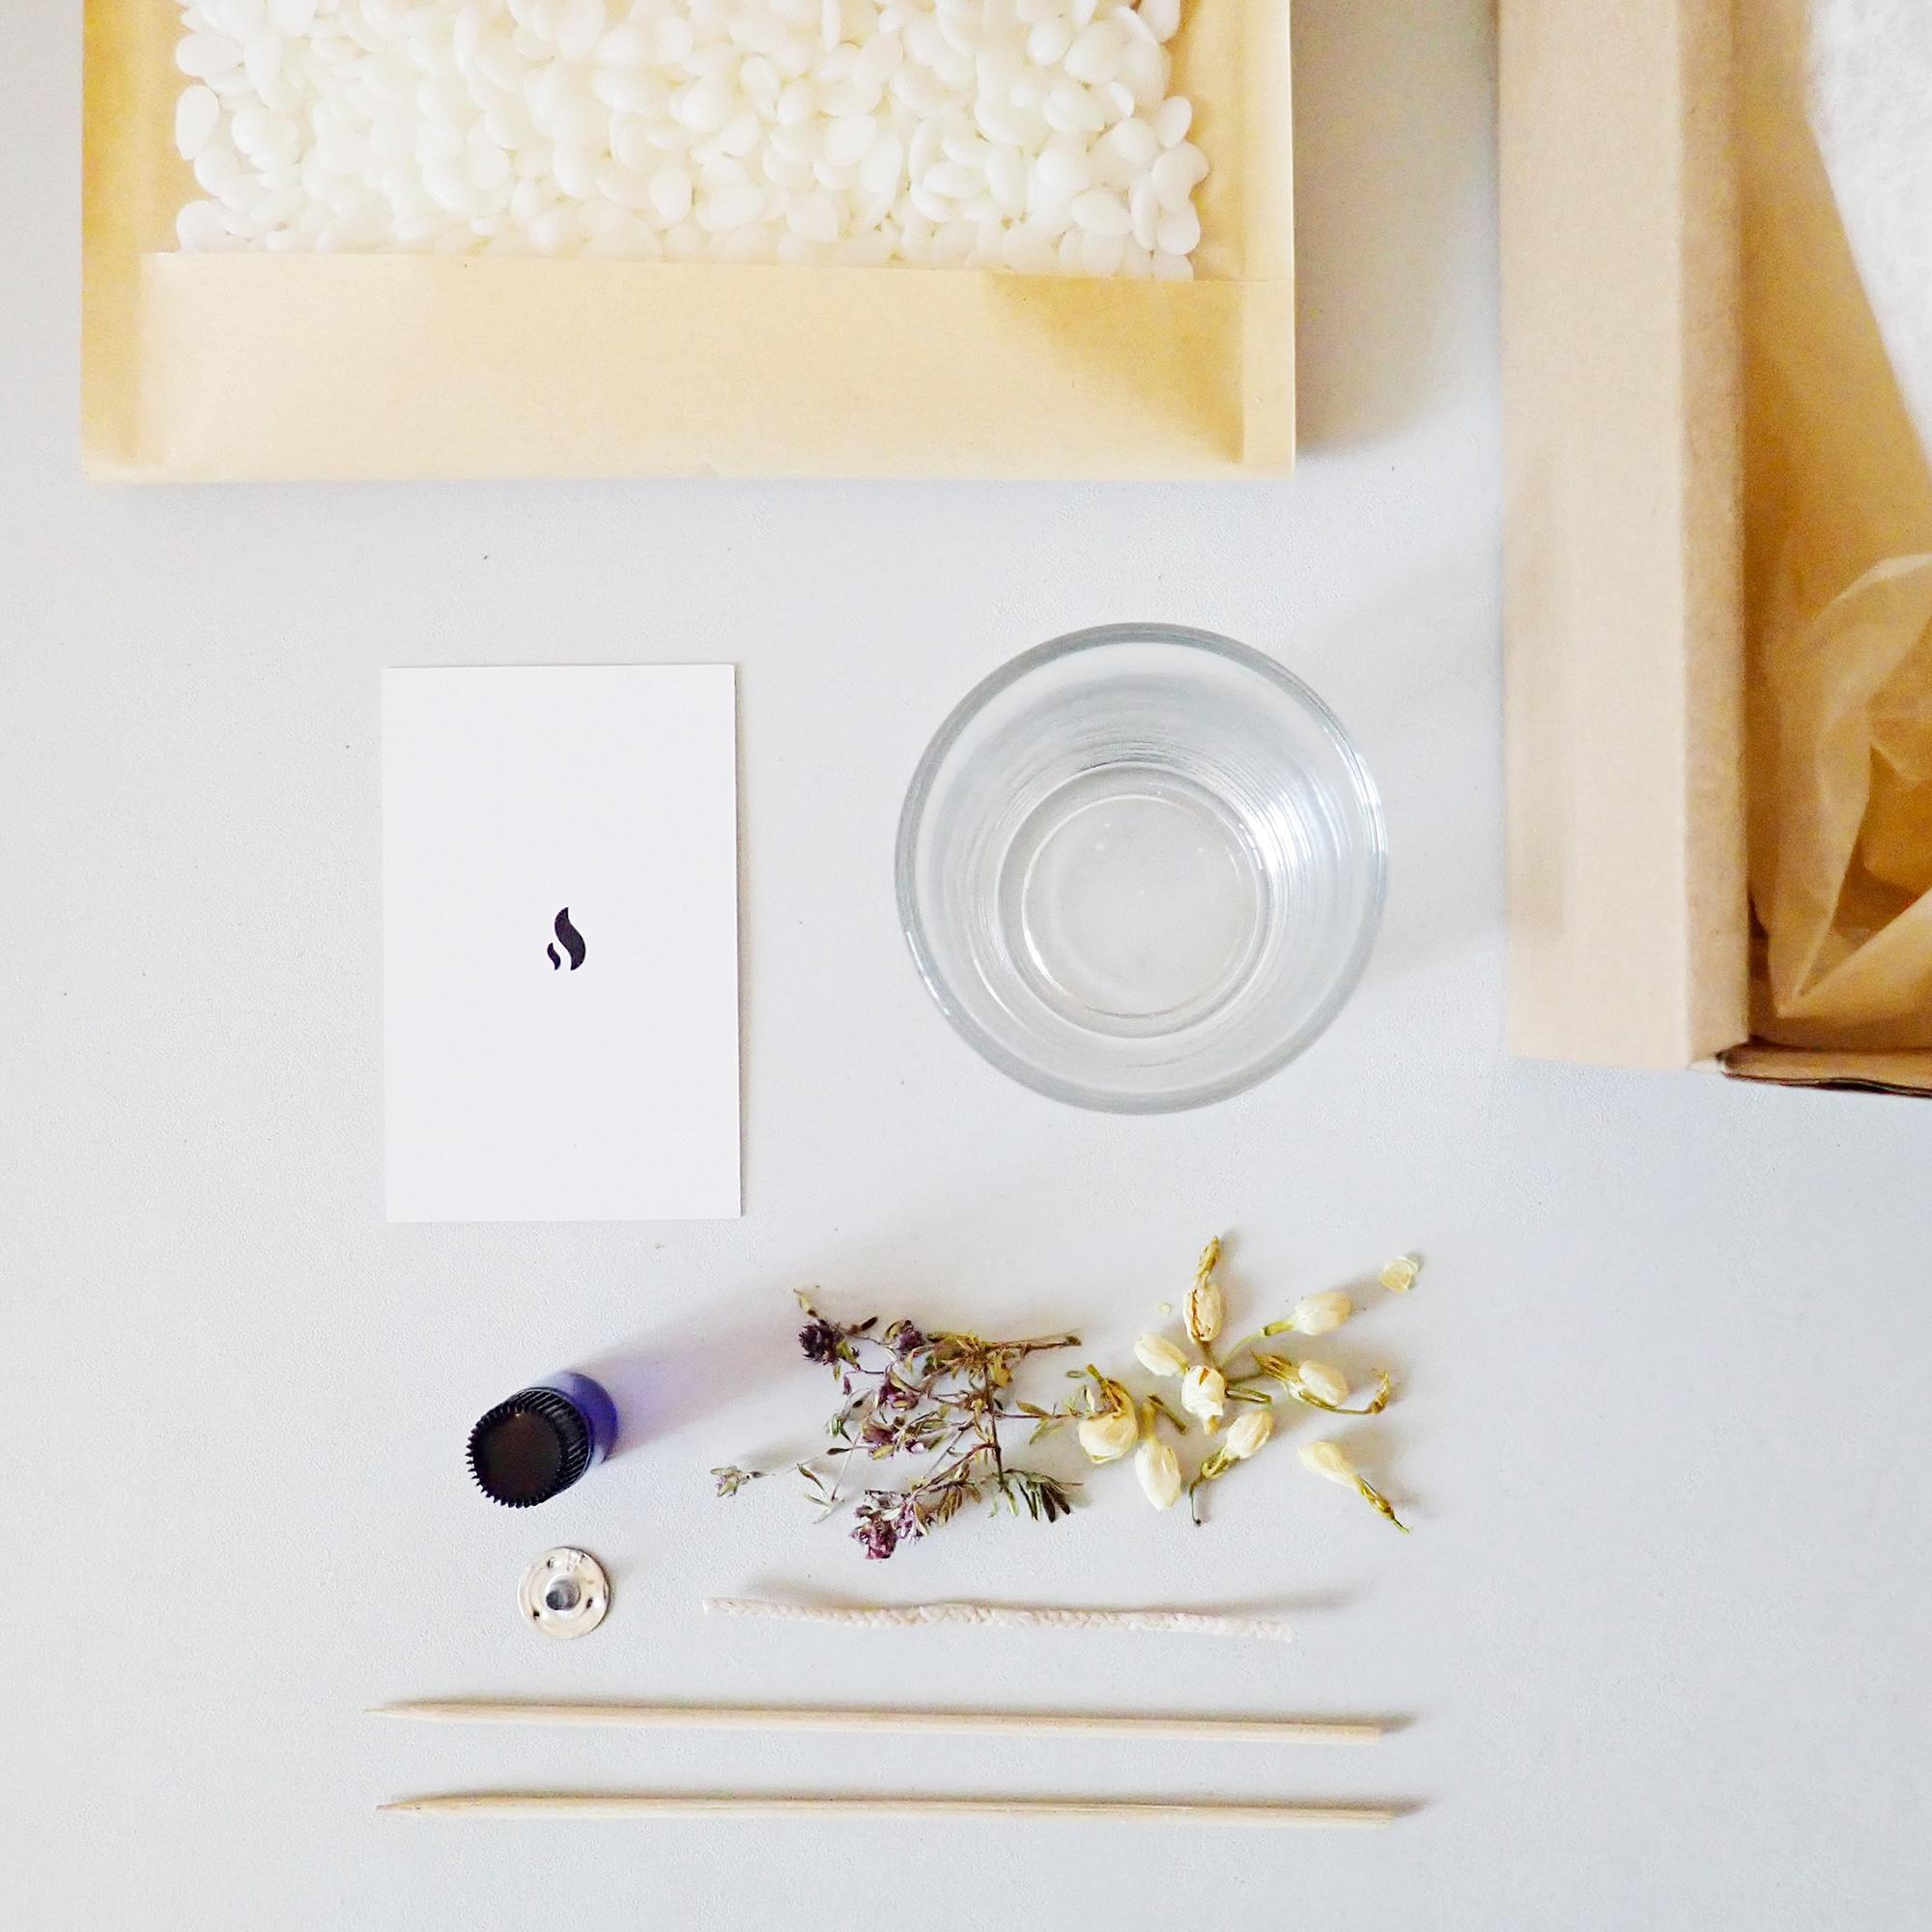 kit cr ation bougie diy 150 ml bougie cire soja parfum e. Black Bedroom Furniture Sets. Home Design Ideas